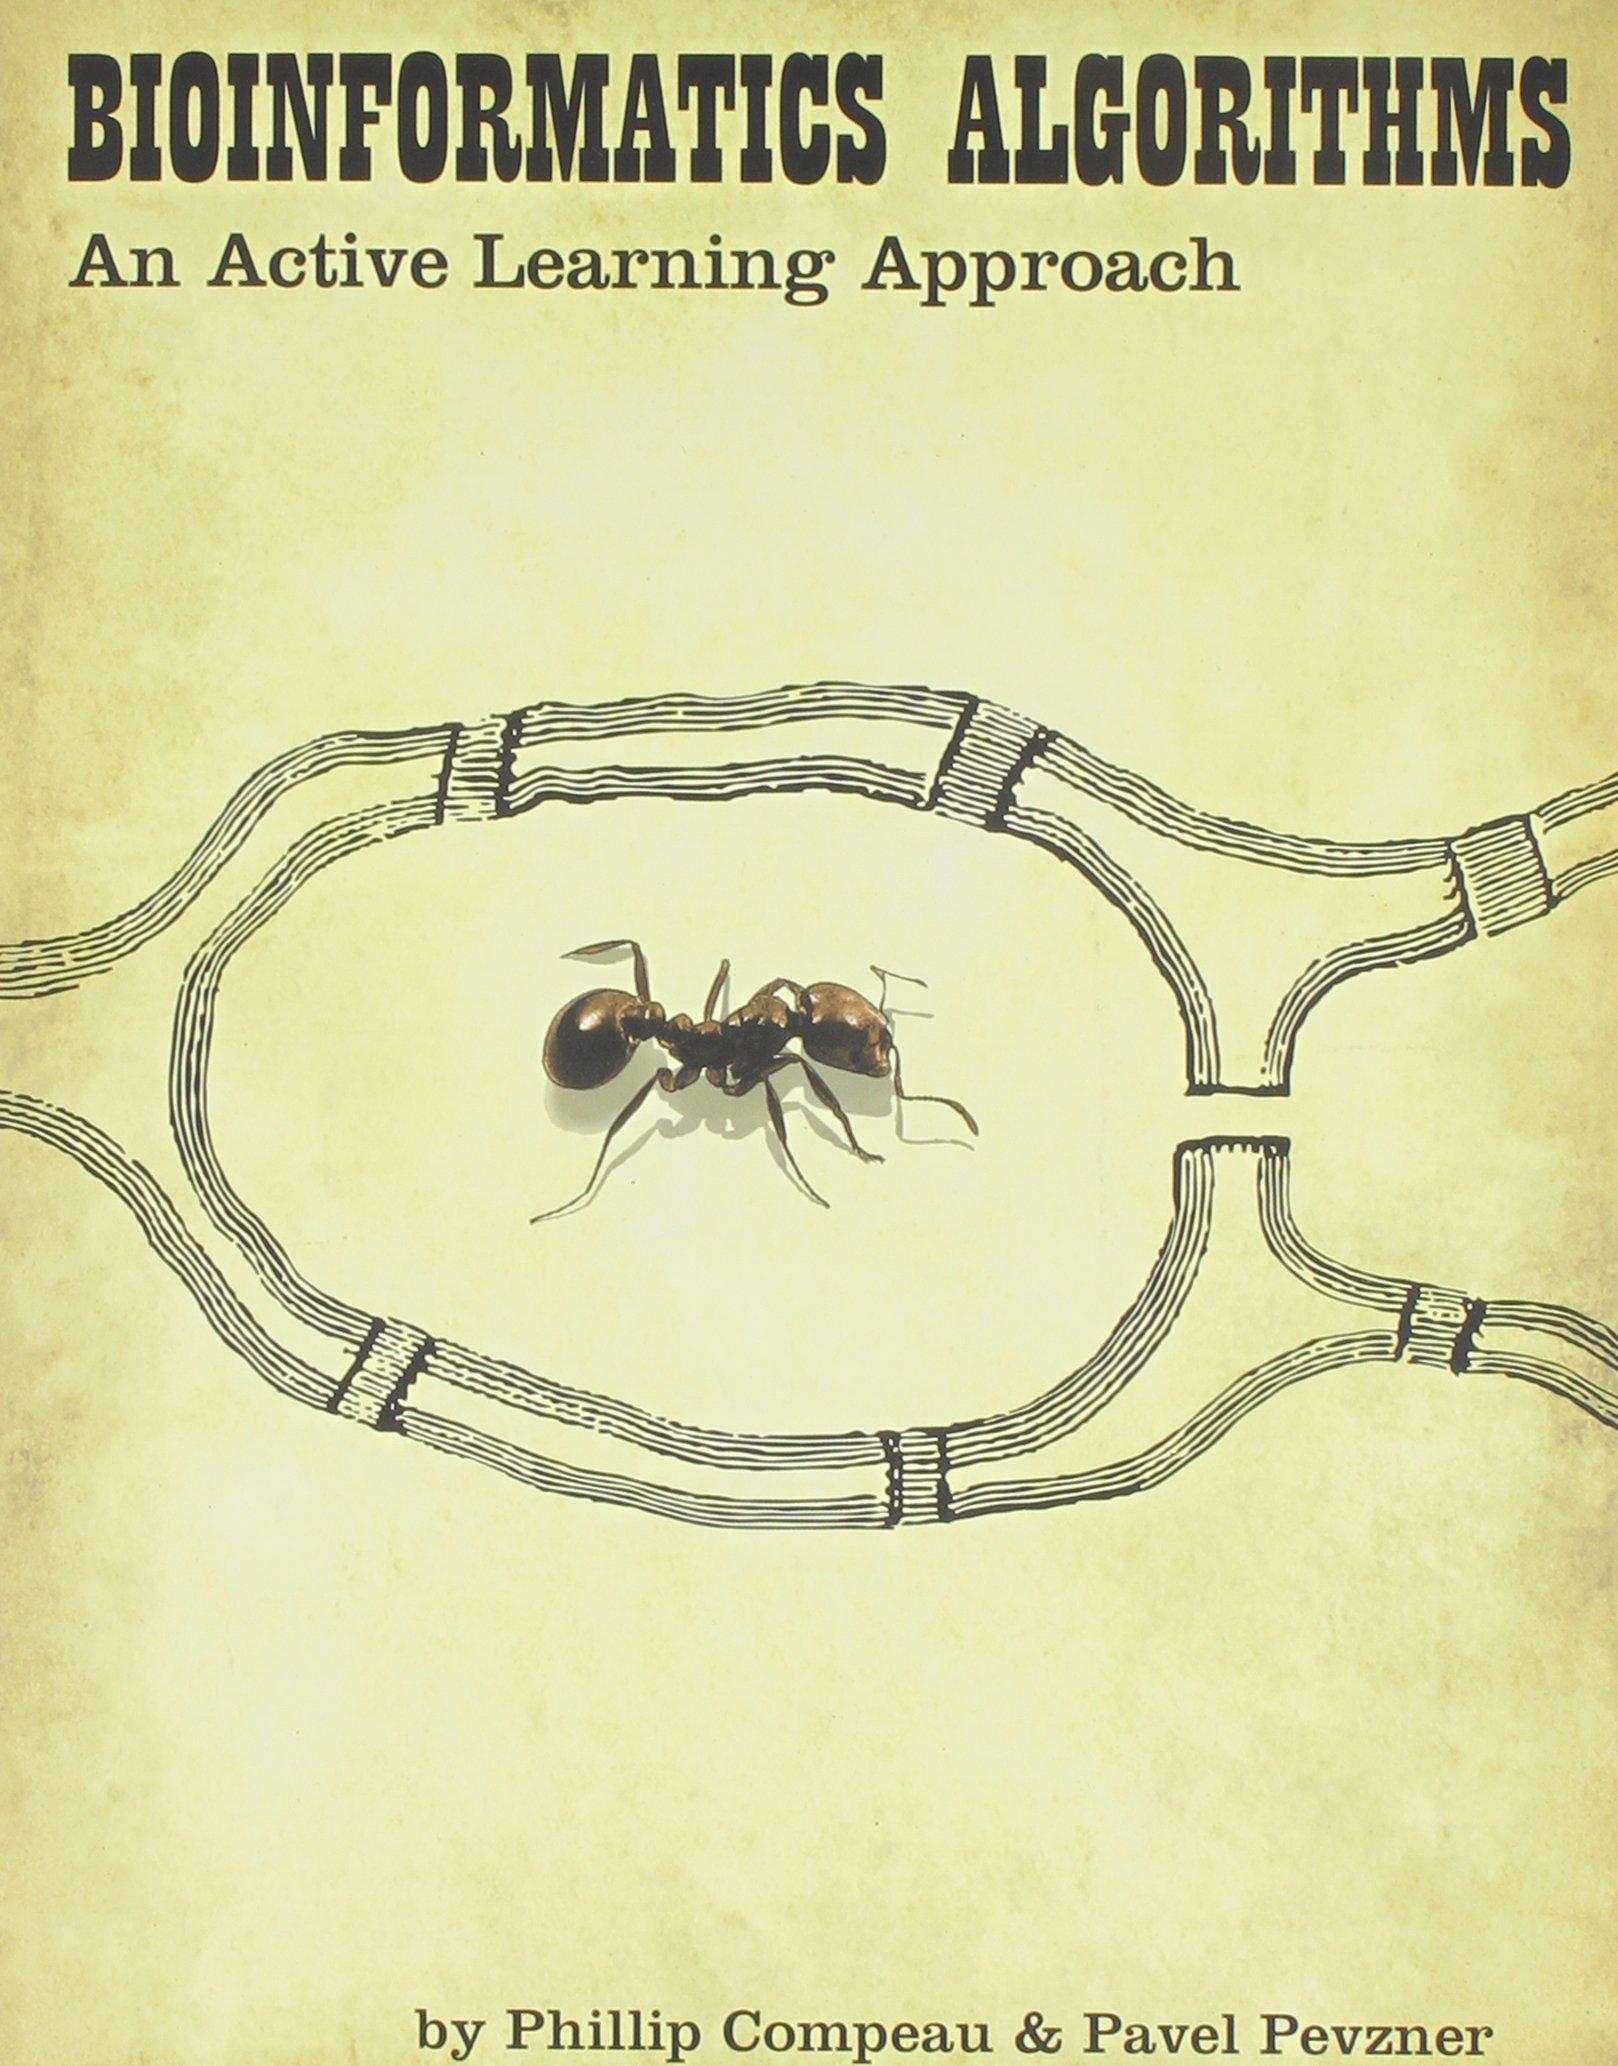 Bioinformatics algorithms an active learning approach phillip bioinformatics algorithms an active learning approach phillip compeau 9780990374602 amazon books fandeluxe Images